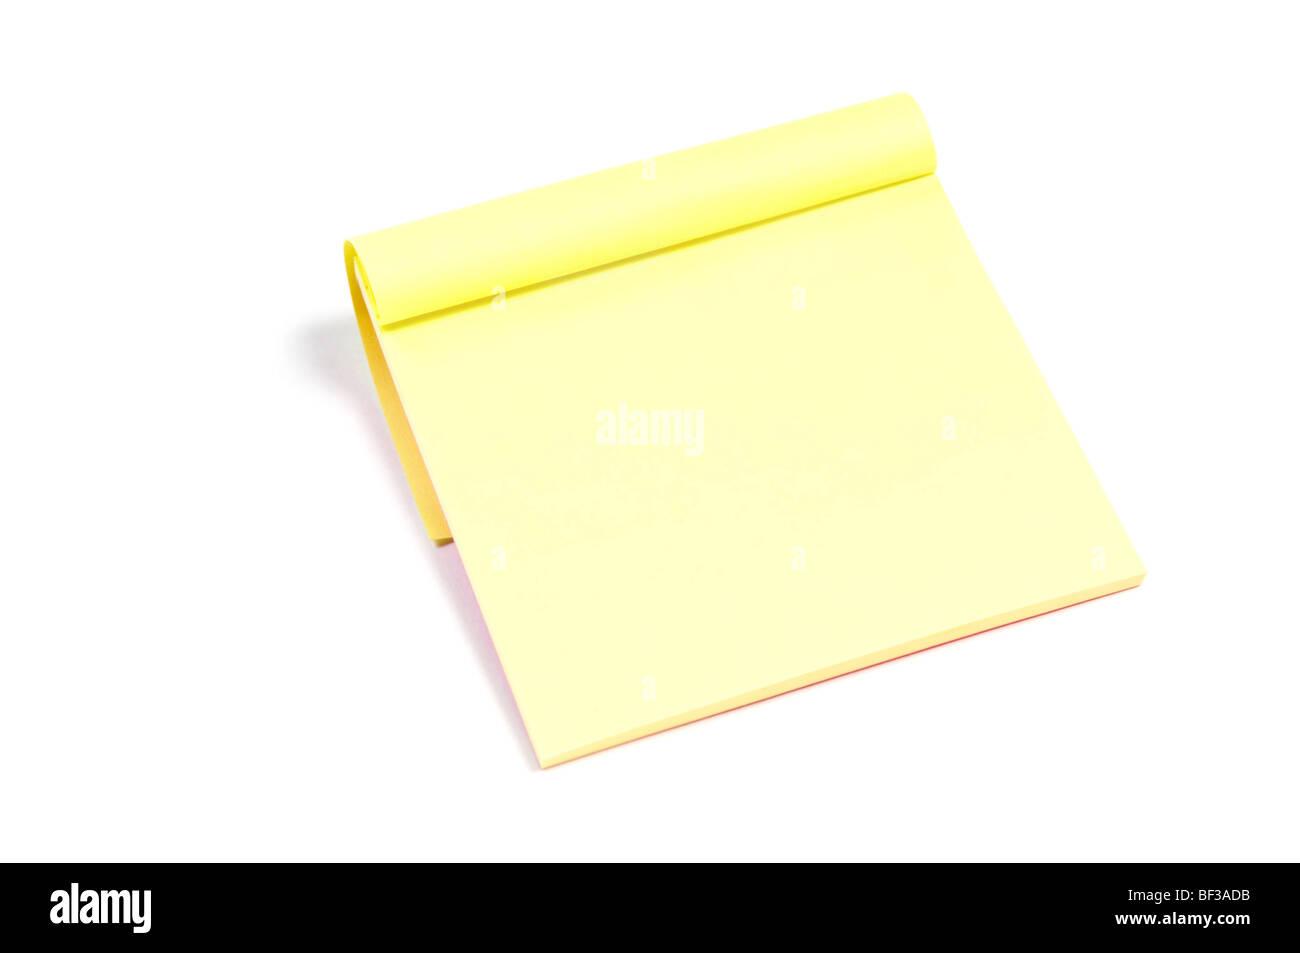 Nota adesiva carta pad isolato su bianco Immagini Stock